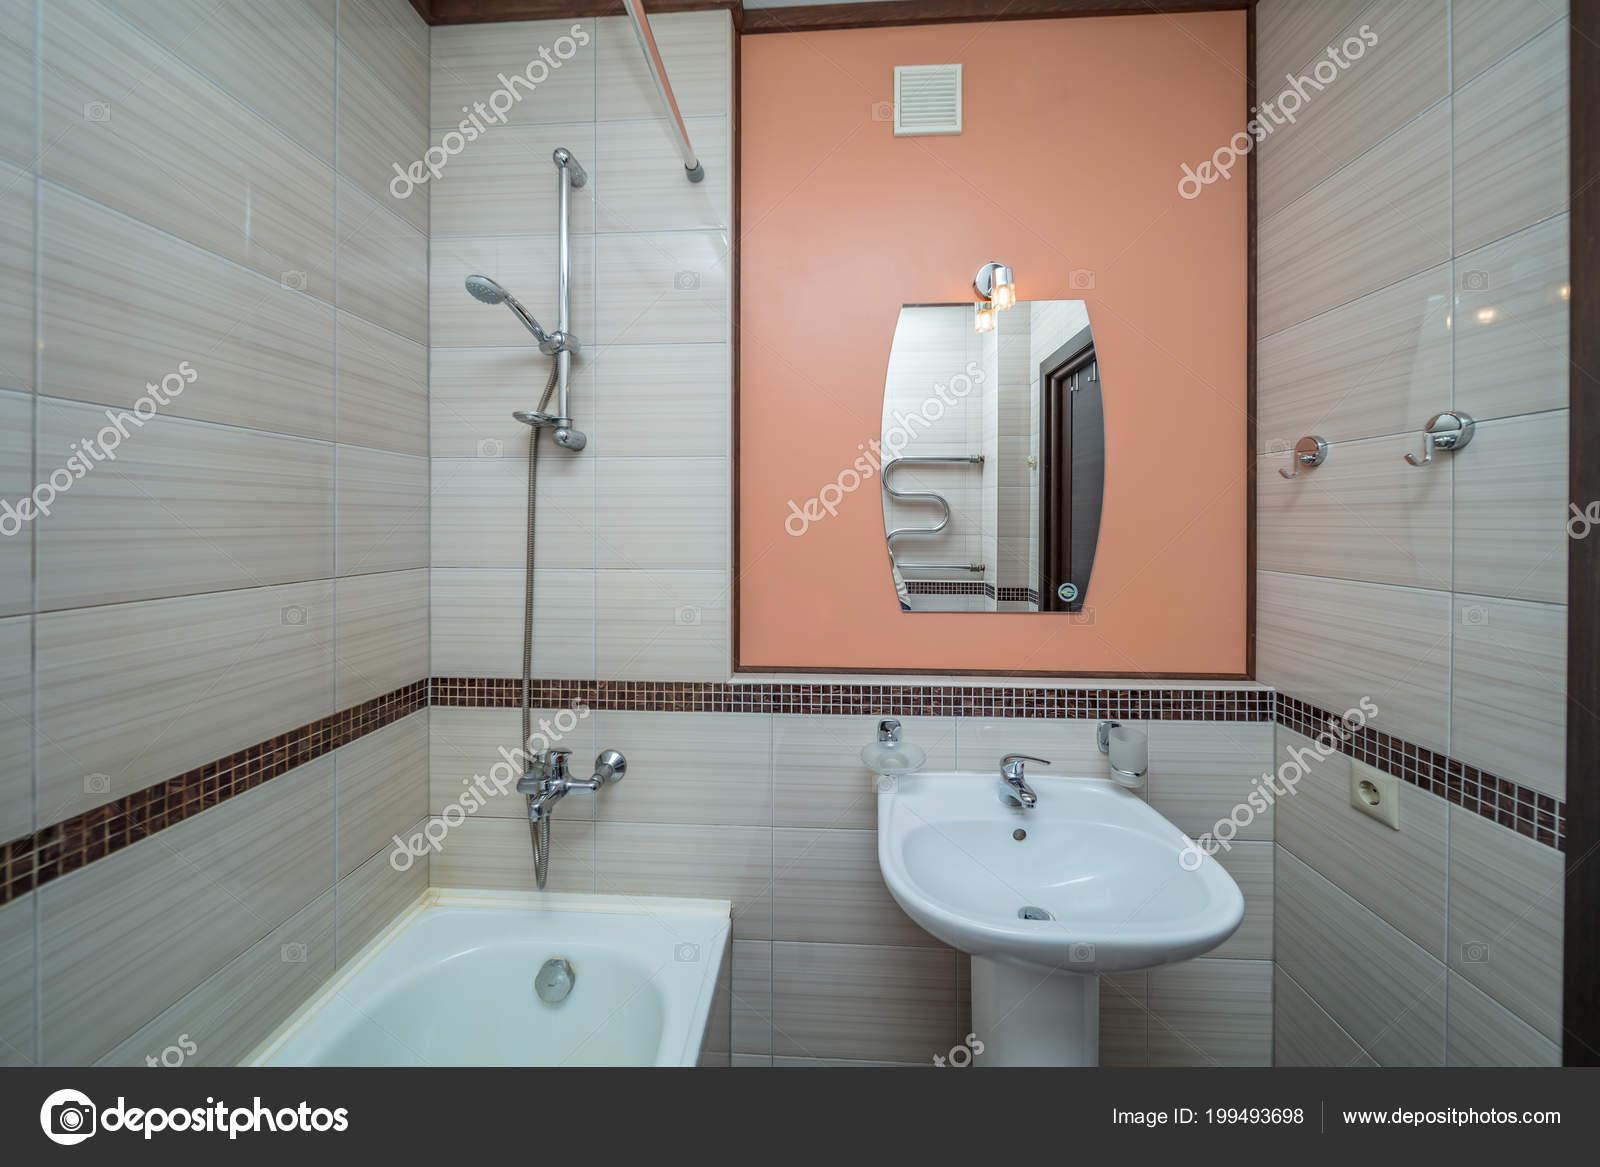 carrelage beige petite salle bains avec baignoire lavabo photographie olgasweet 199493698. Black Bedroom Furniture Sets. Home Design Ideas